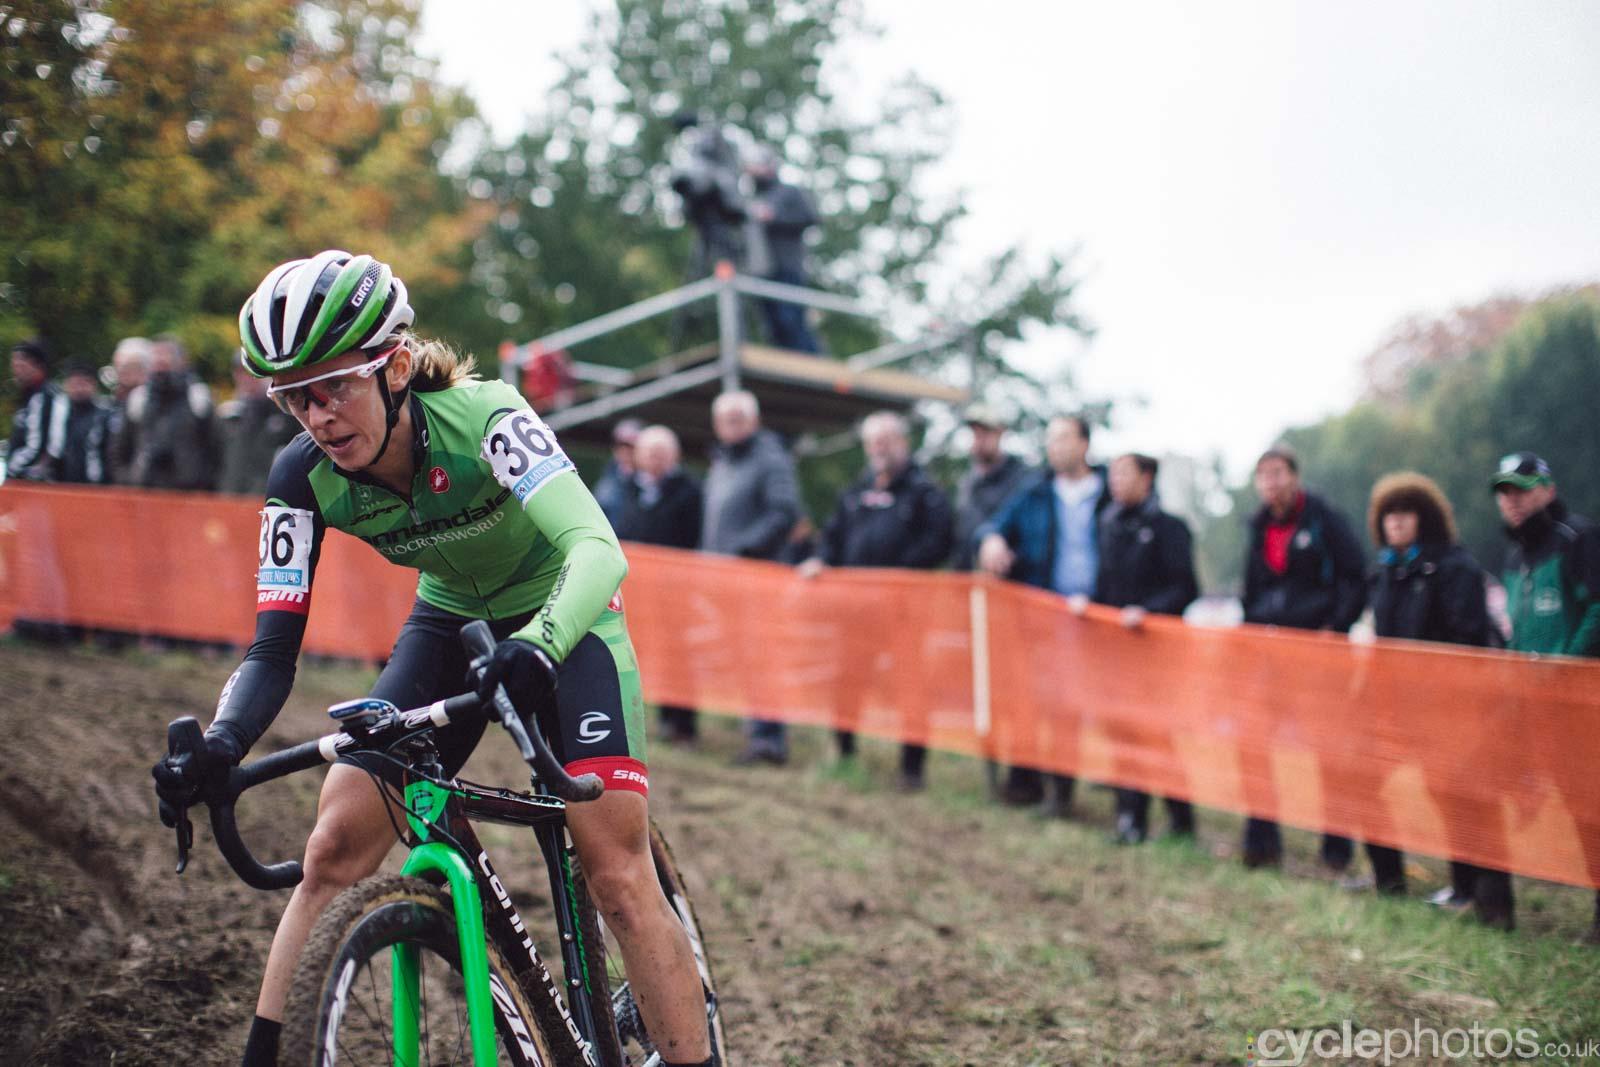 2015-cyclephotos-cyclocross-valkenburg-140131-kaitie-antonneau